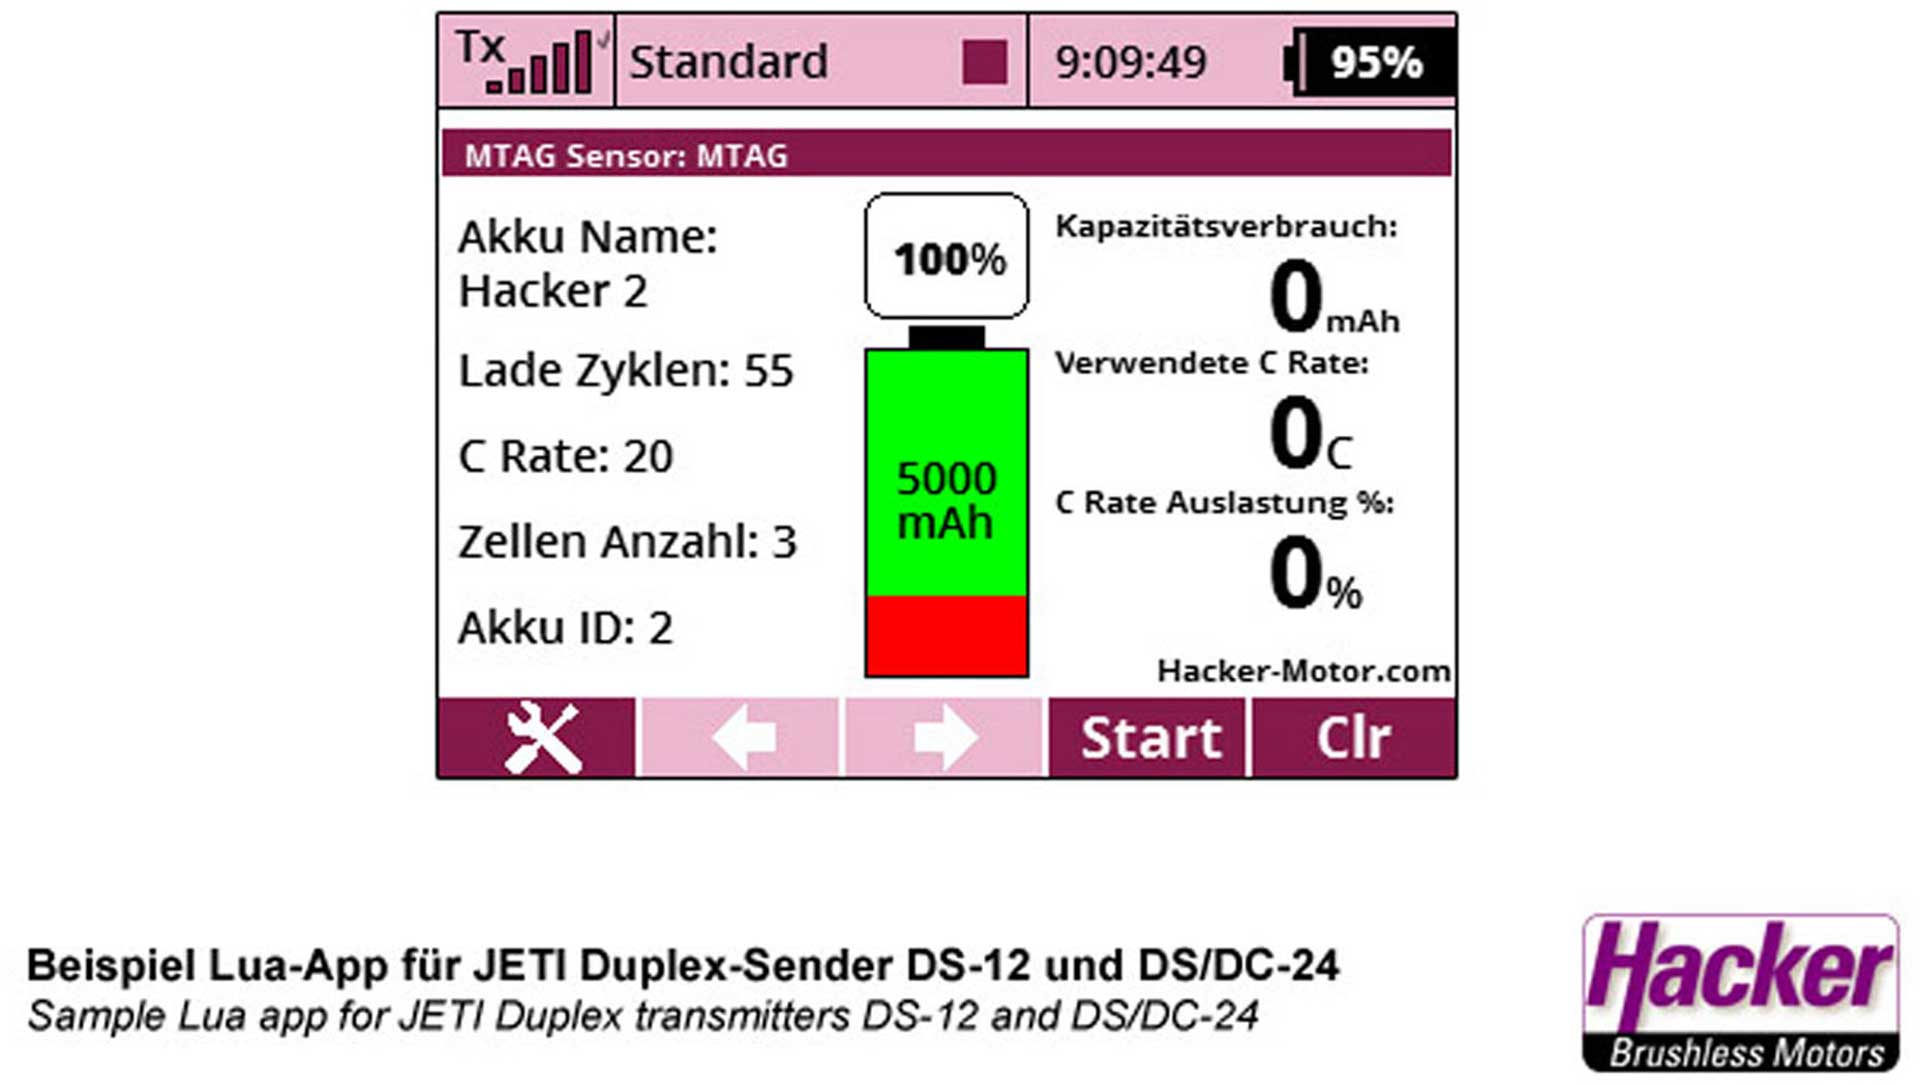 JETI DUPLEX 2.4EX TOPFUEL MTAG BATTERY SENSOR